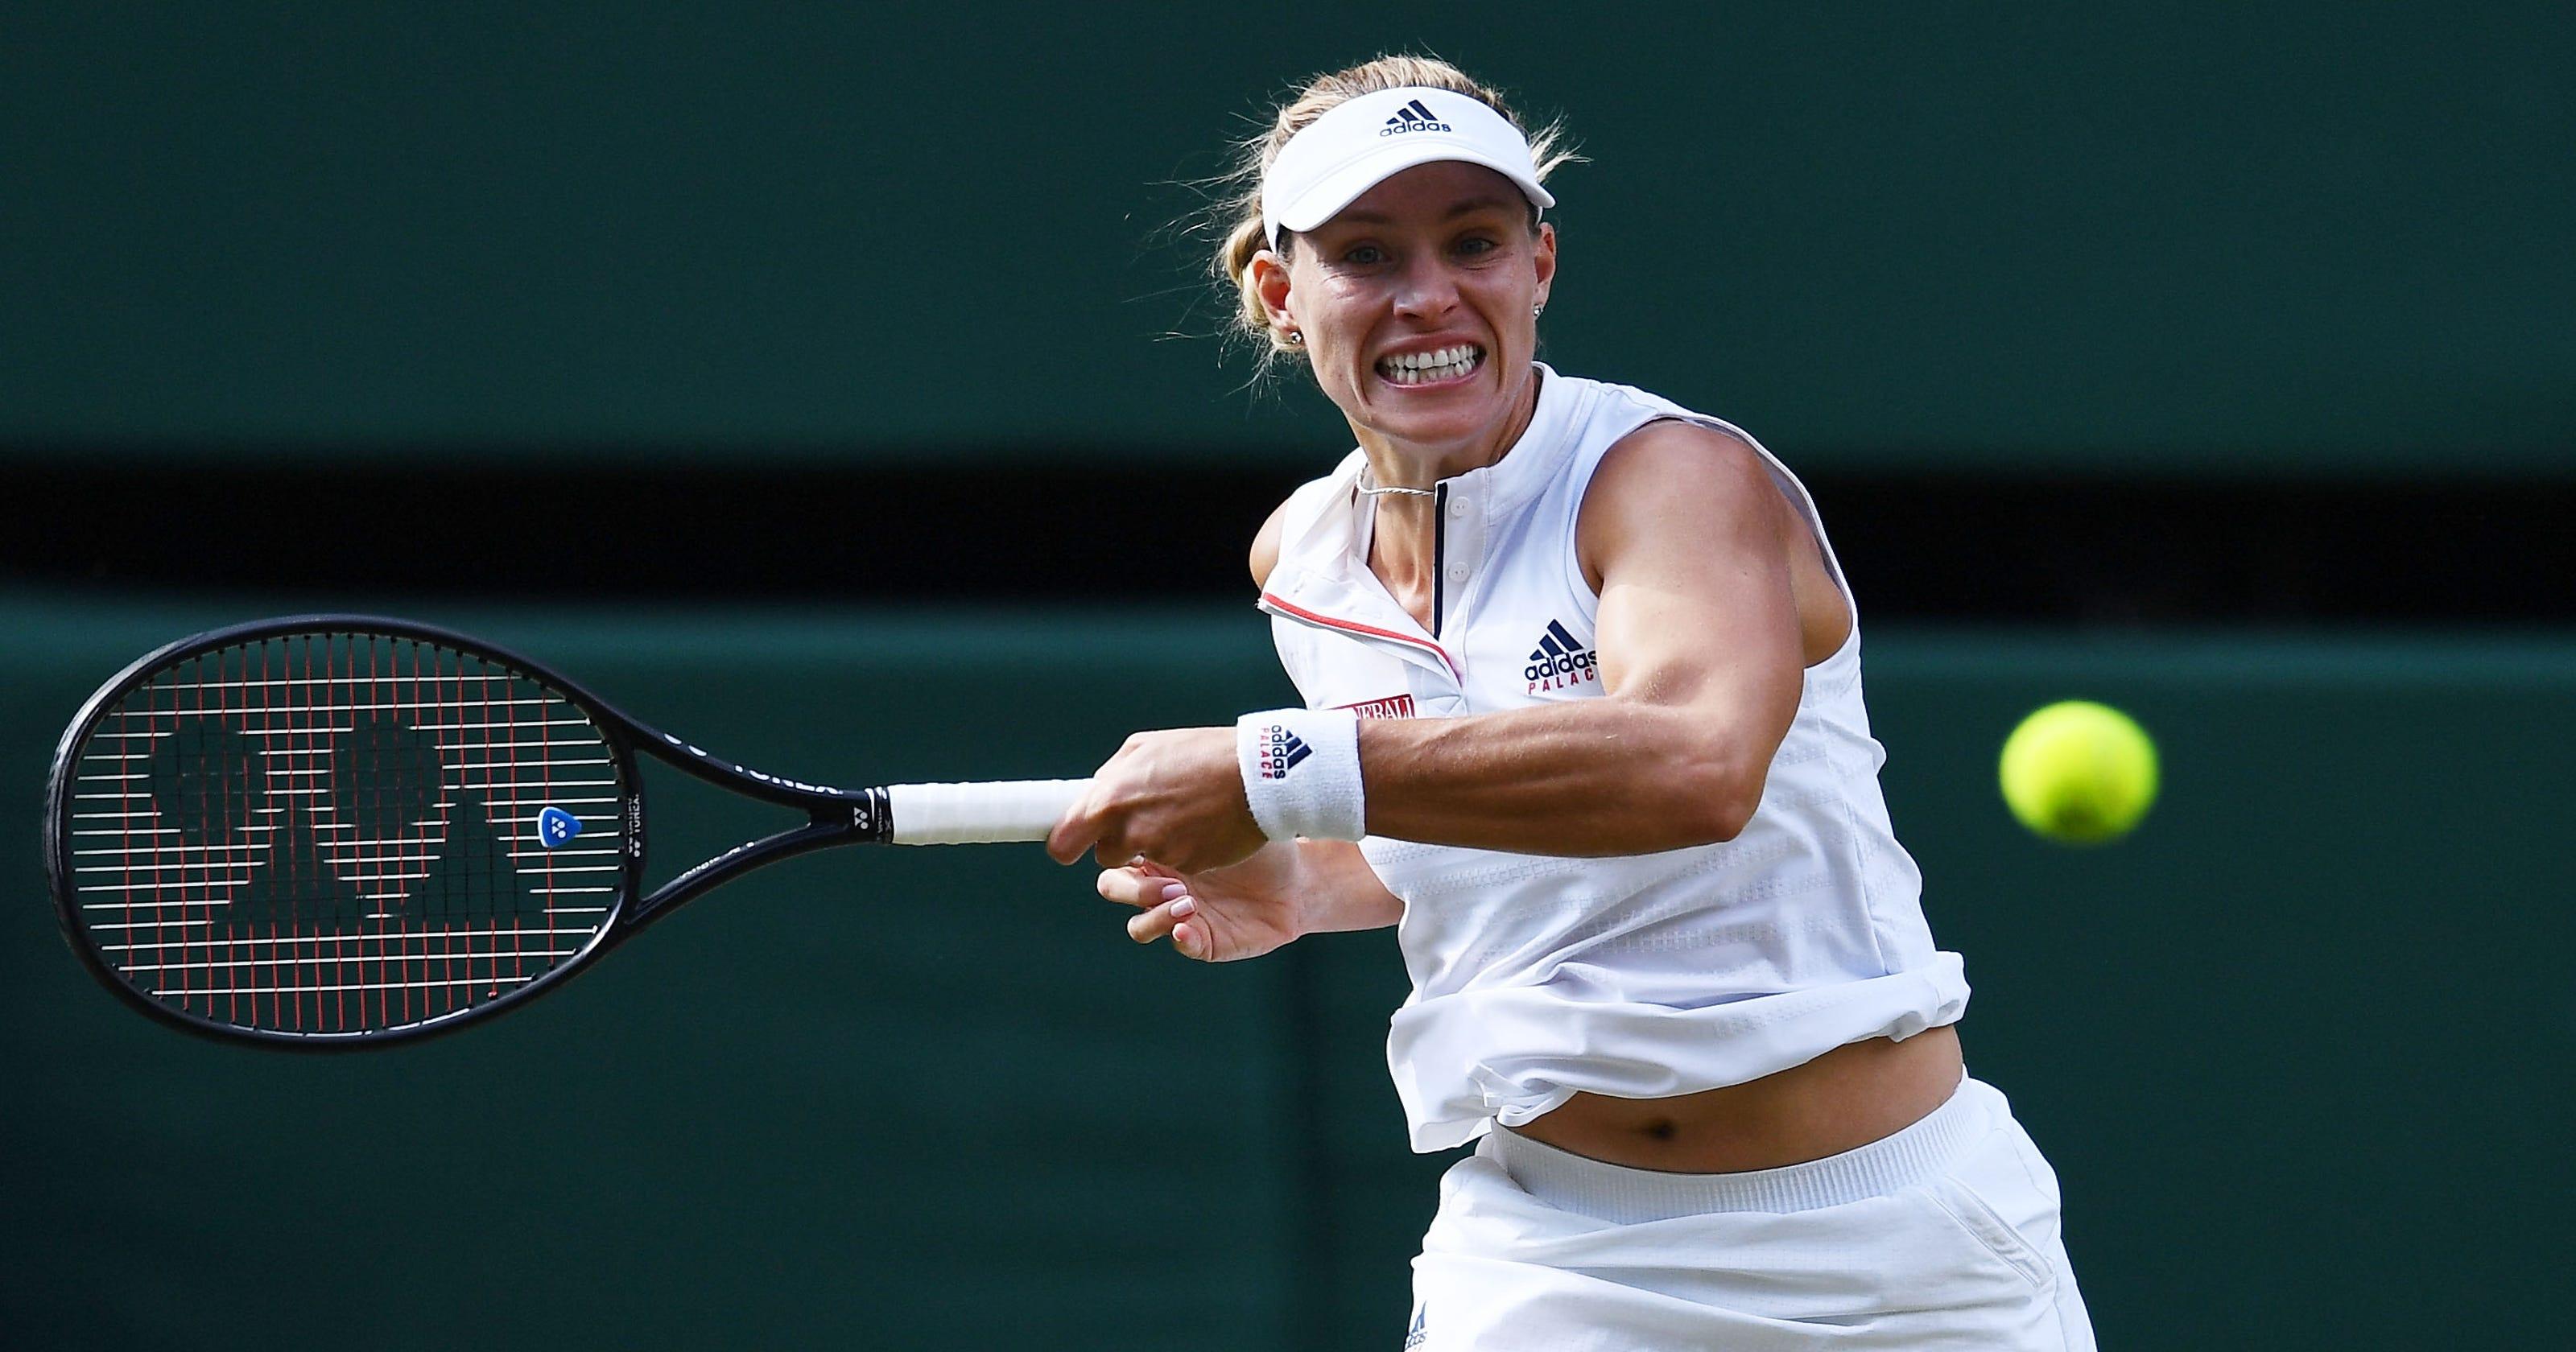 Wimbledon  Angelique Kerber beats Serena Williams in women s final b96281740fe3f